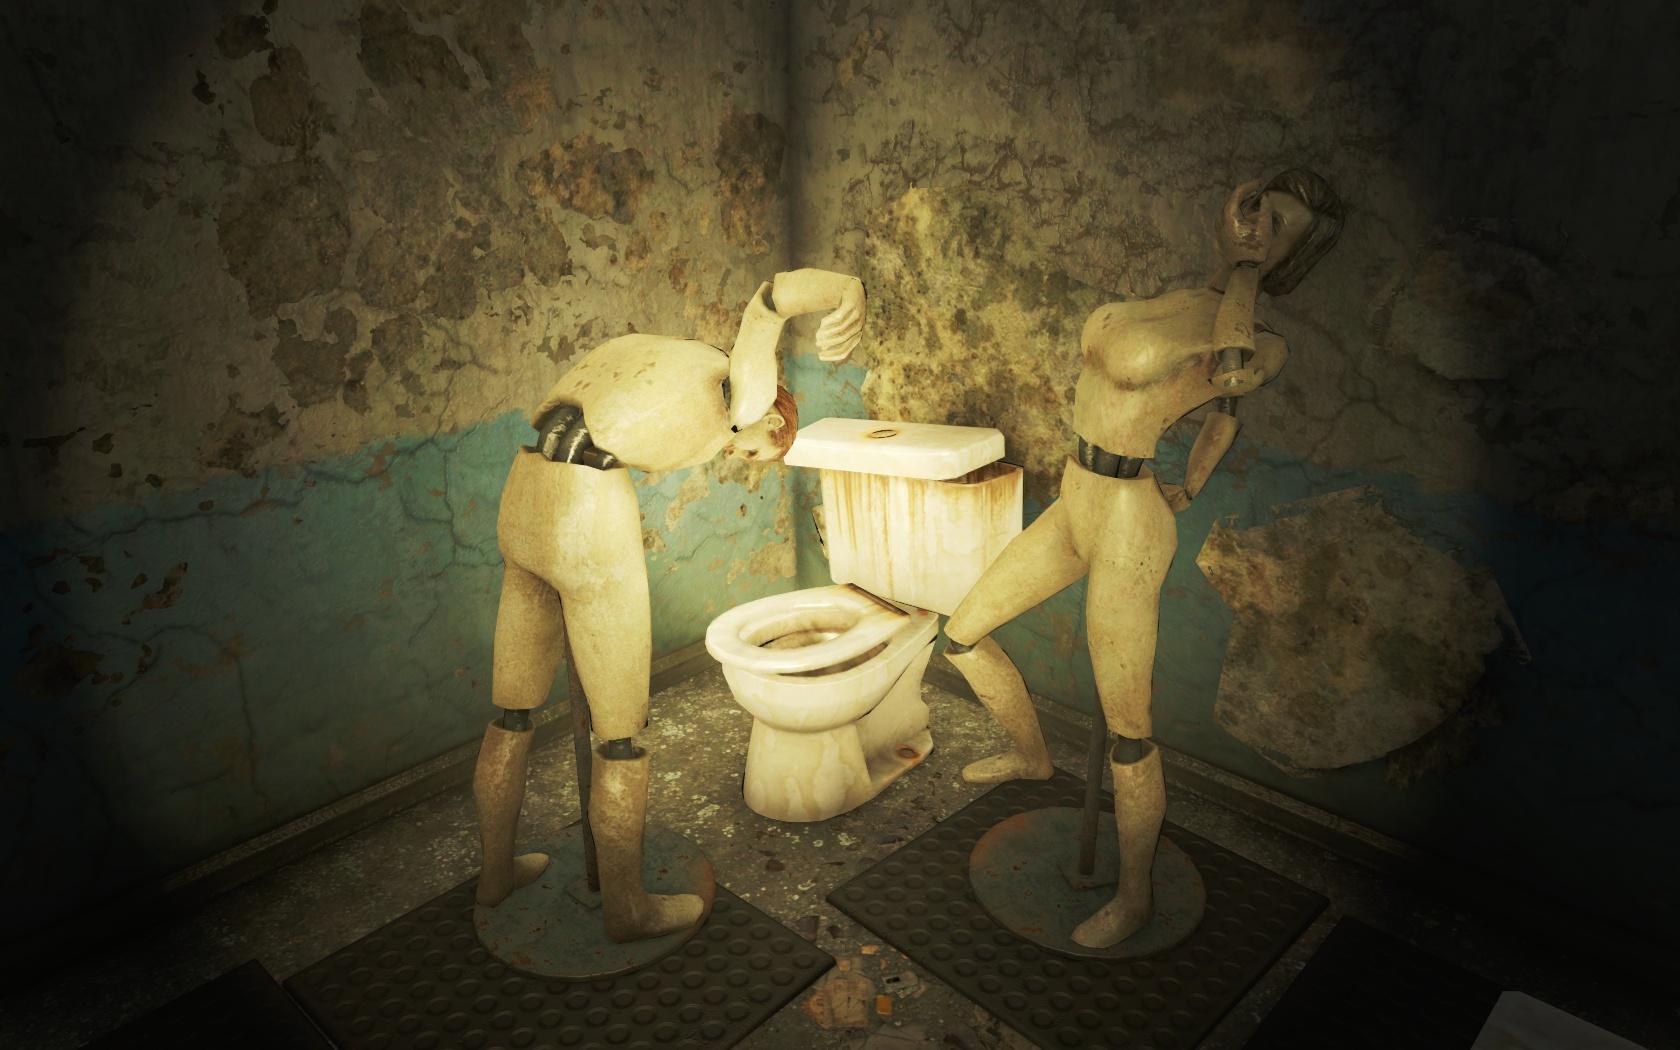 Пьяные танцы (Ядер-Мир, Гриль-бар Физзтоп) - Fallout 4 Nuka-World, Гриль-бар, Гриль-бар Физзтоп, манекен, Физзтоп, Ядер-Мир